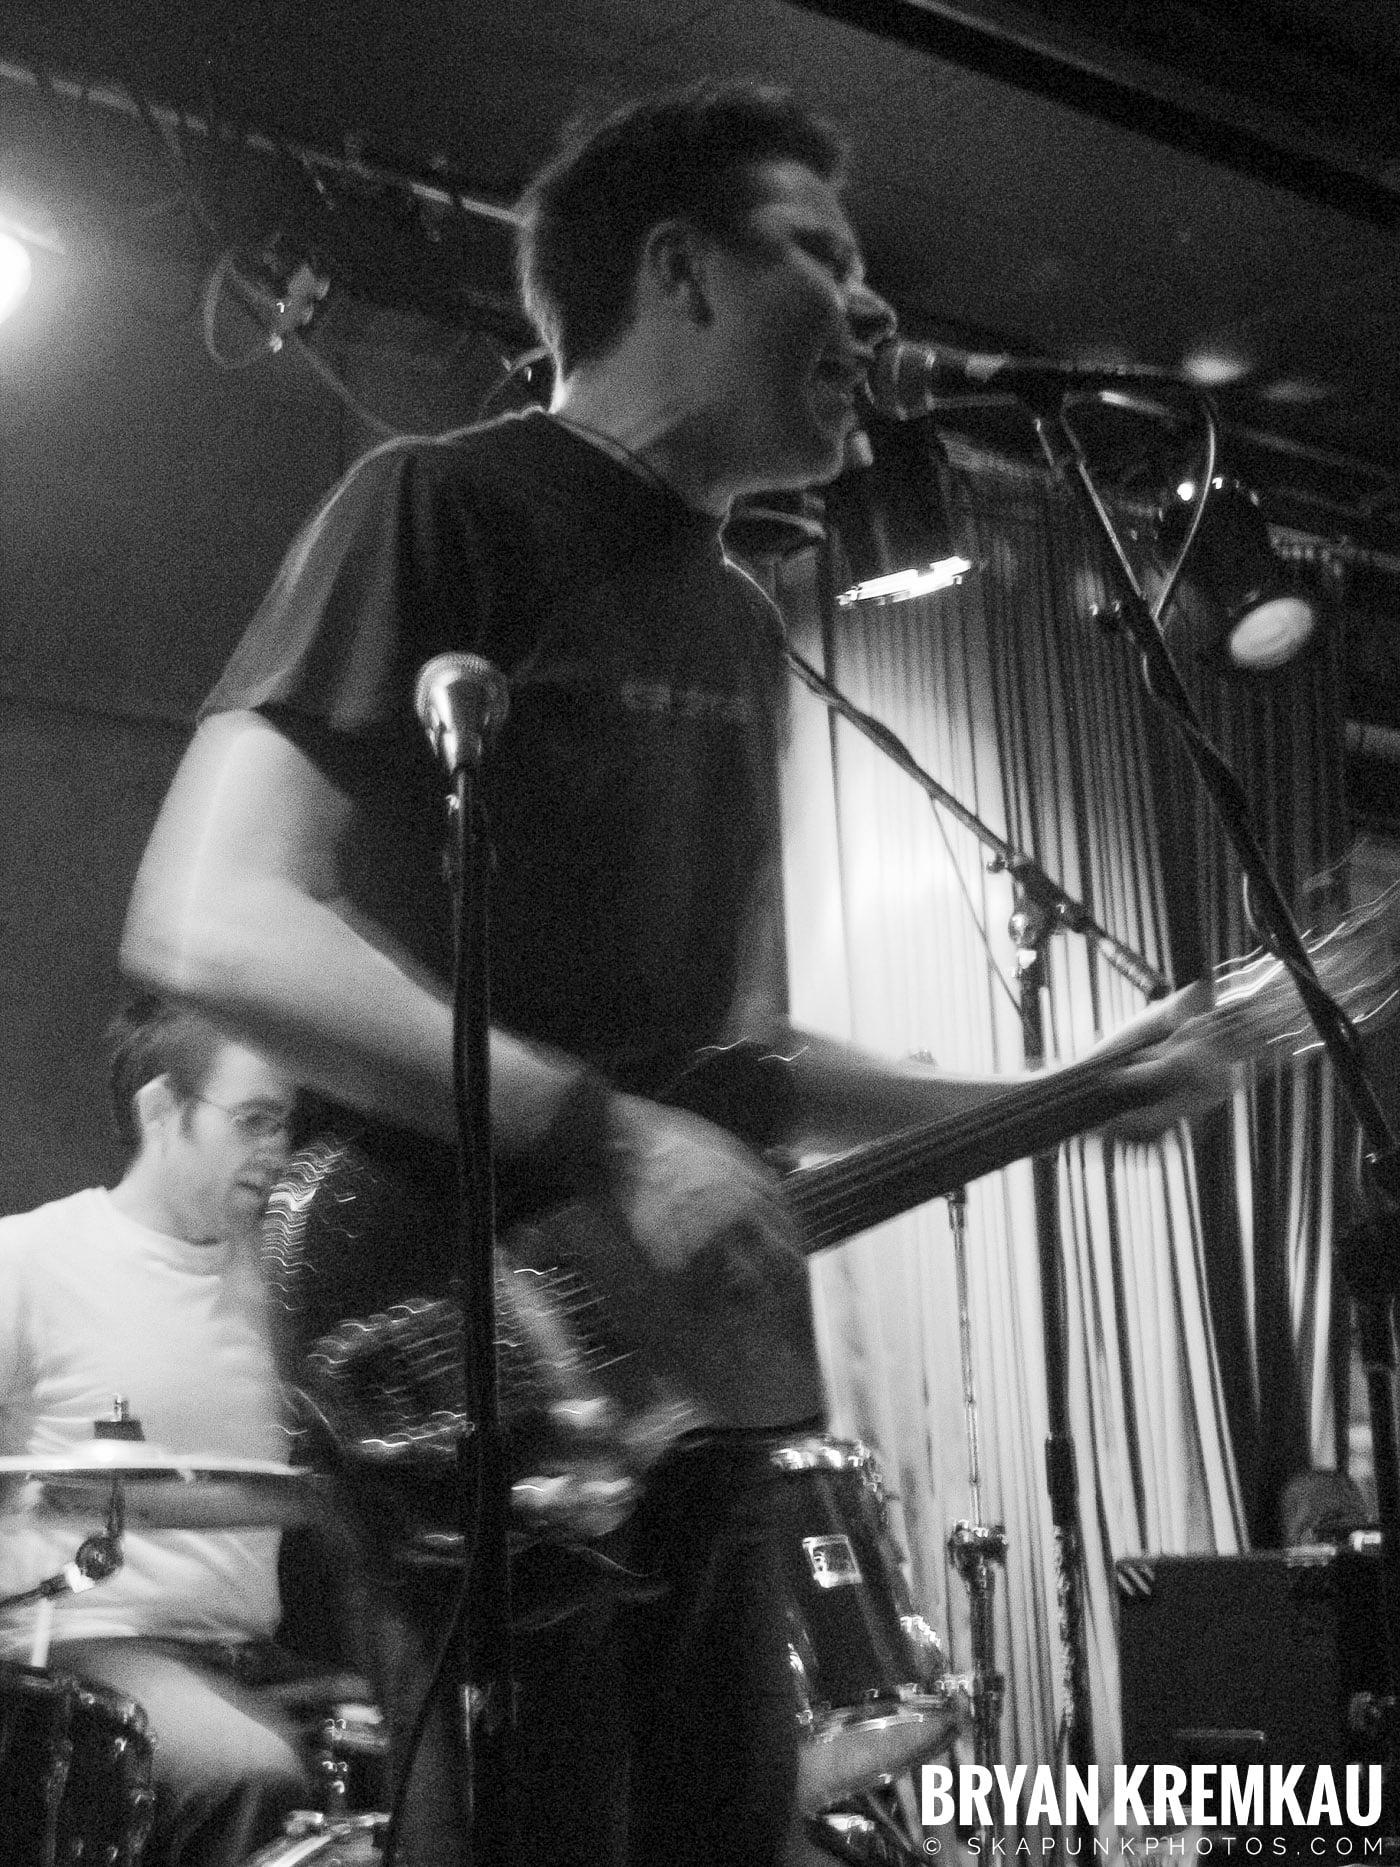 Mark Chadwick @ Red Lion, NYC - 1.22.06 (10)